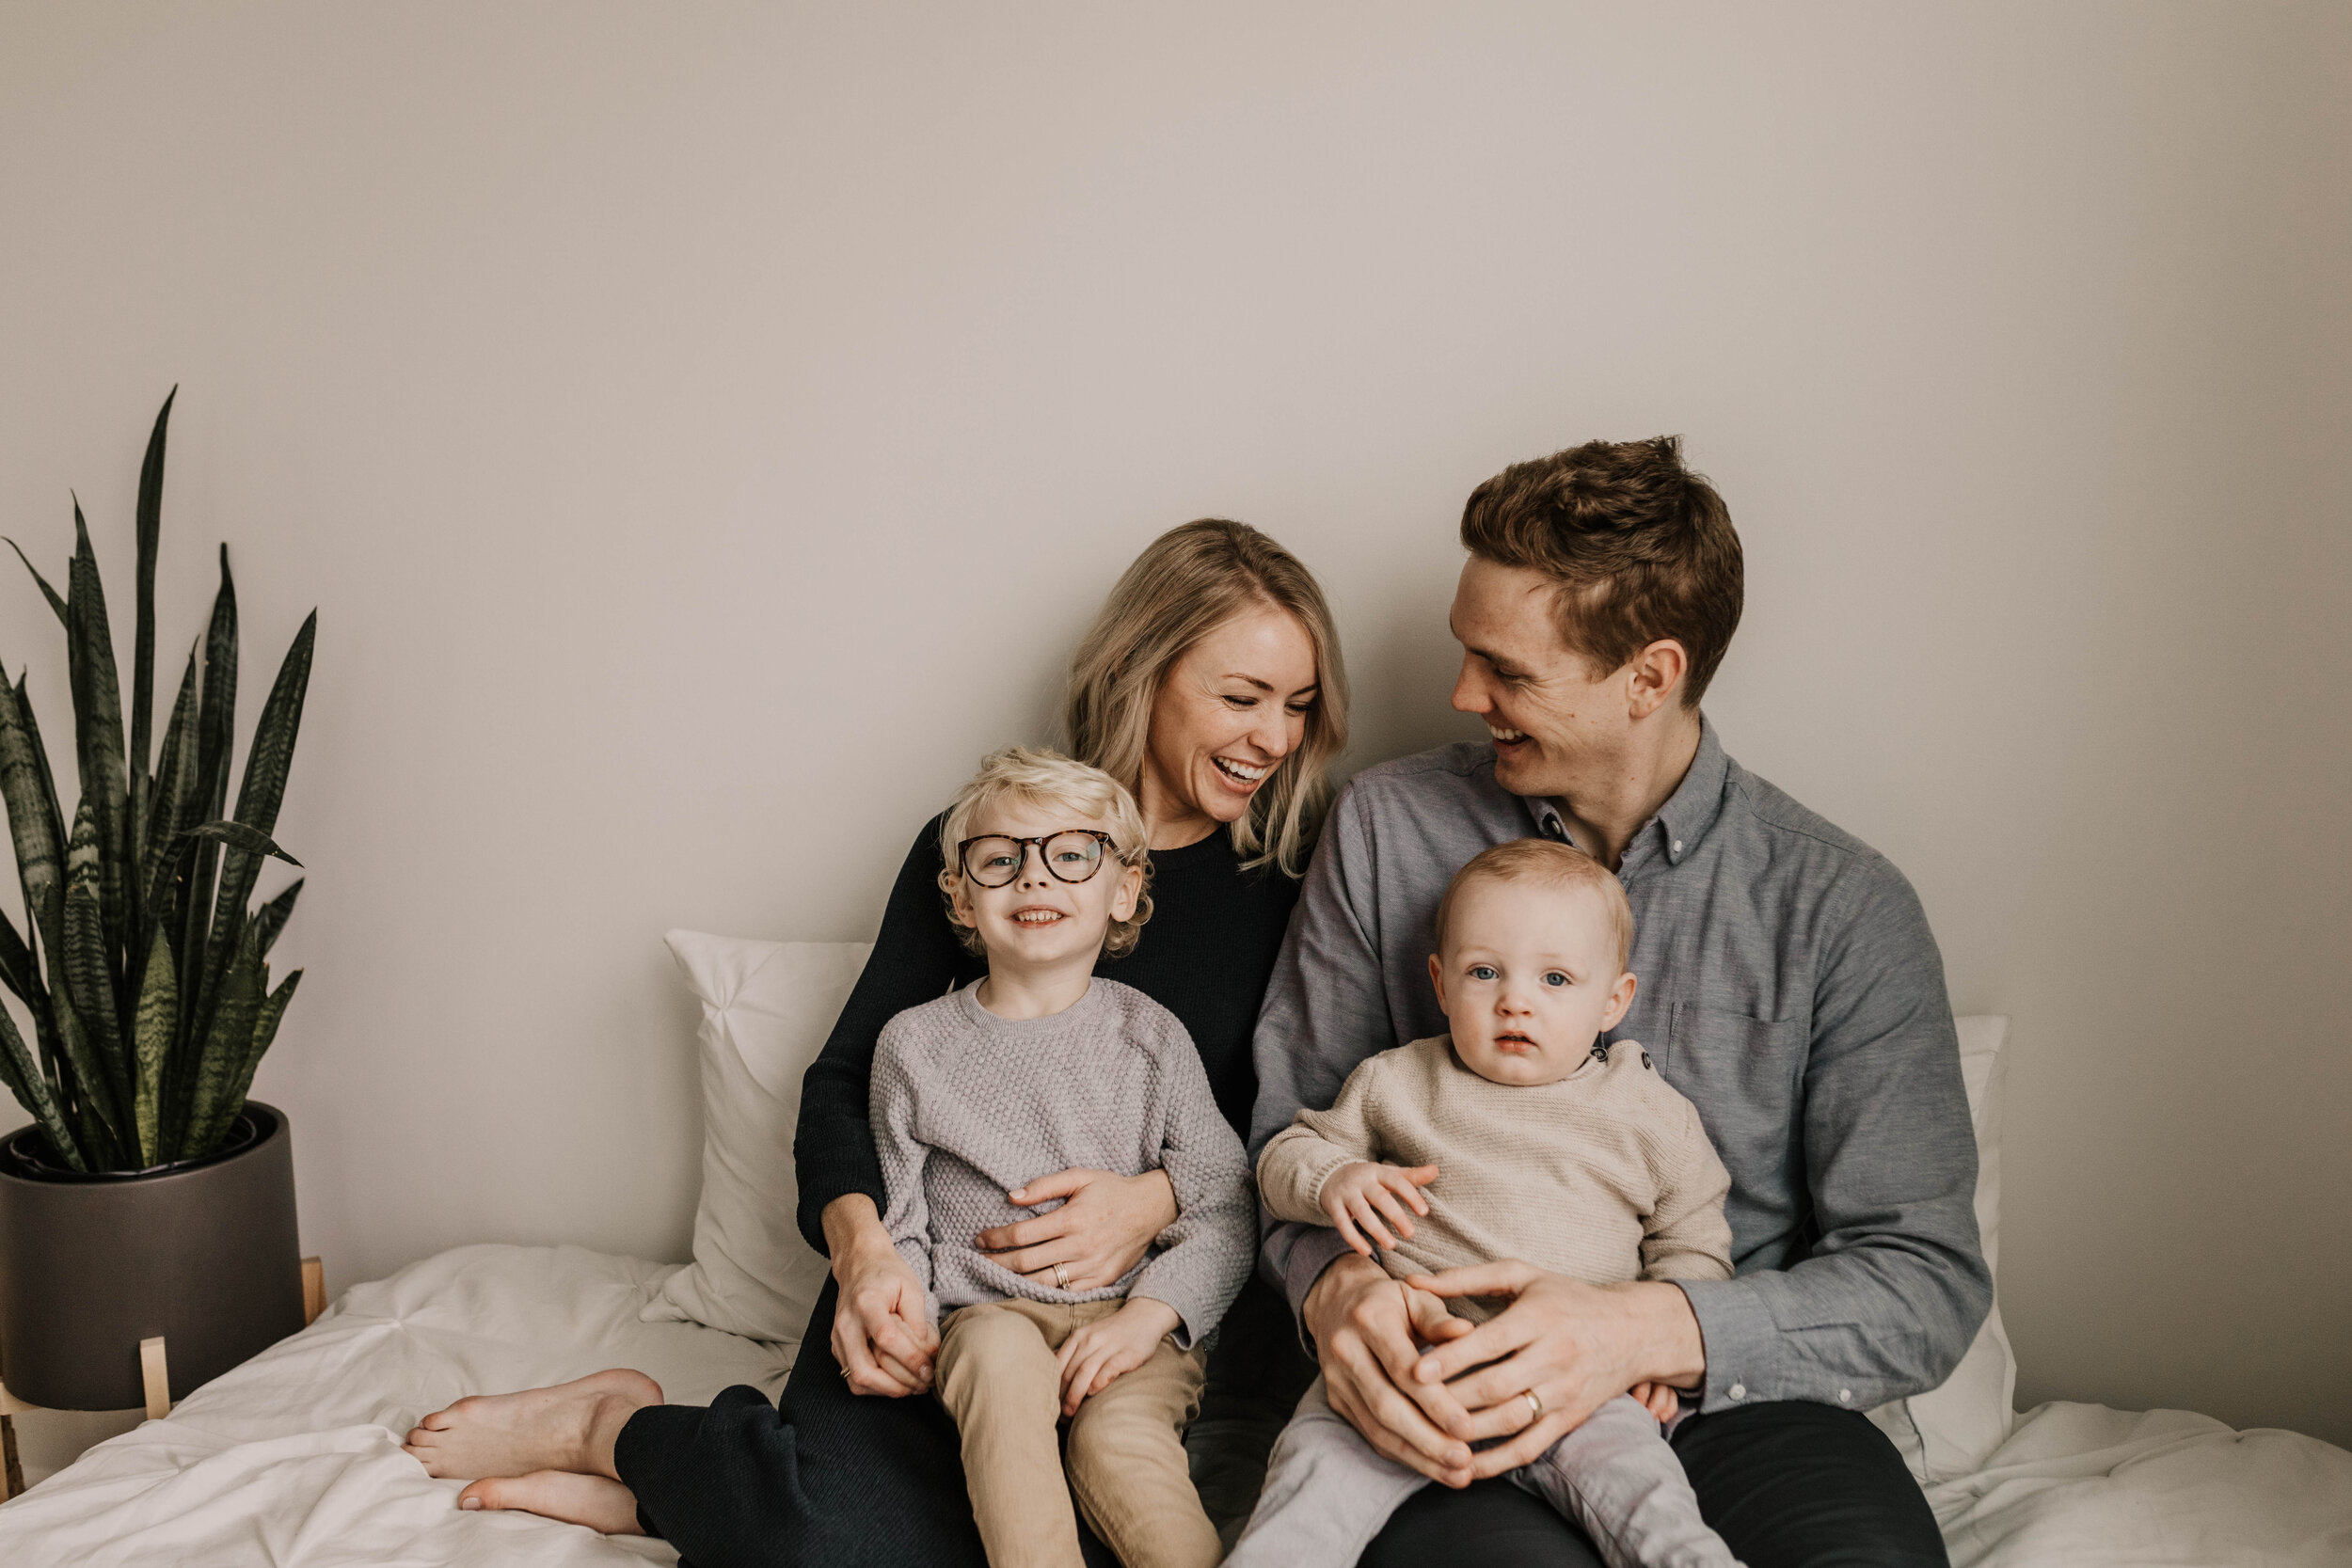 cliffordfamily-3.jpg